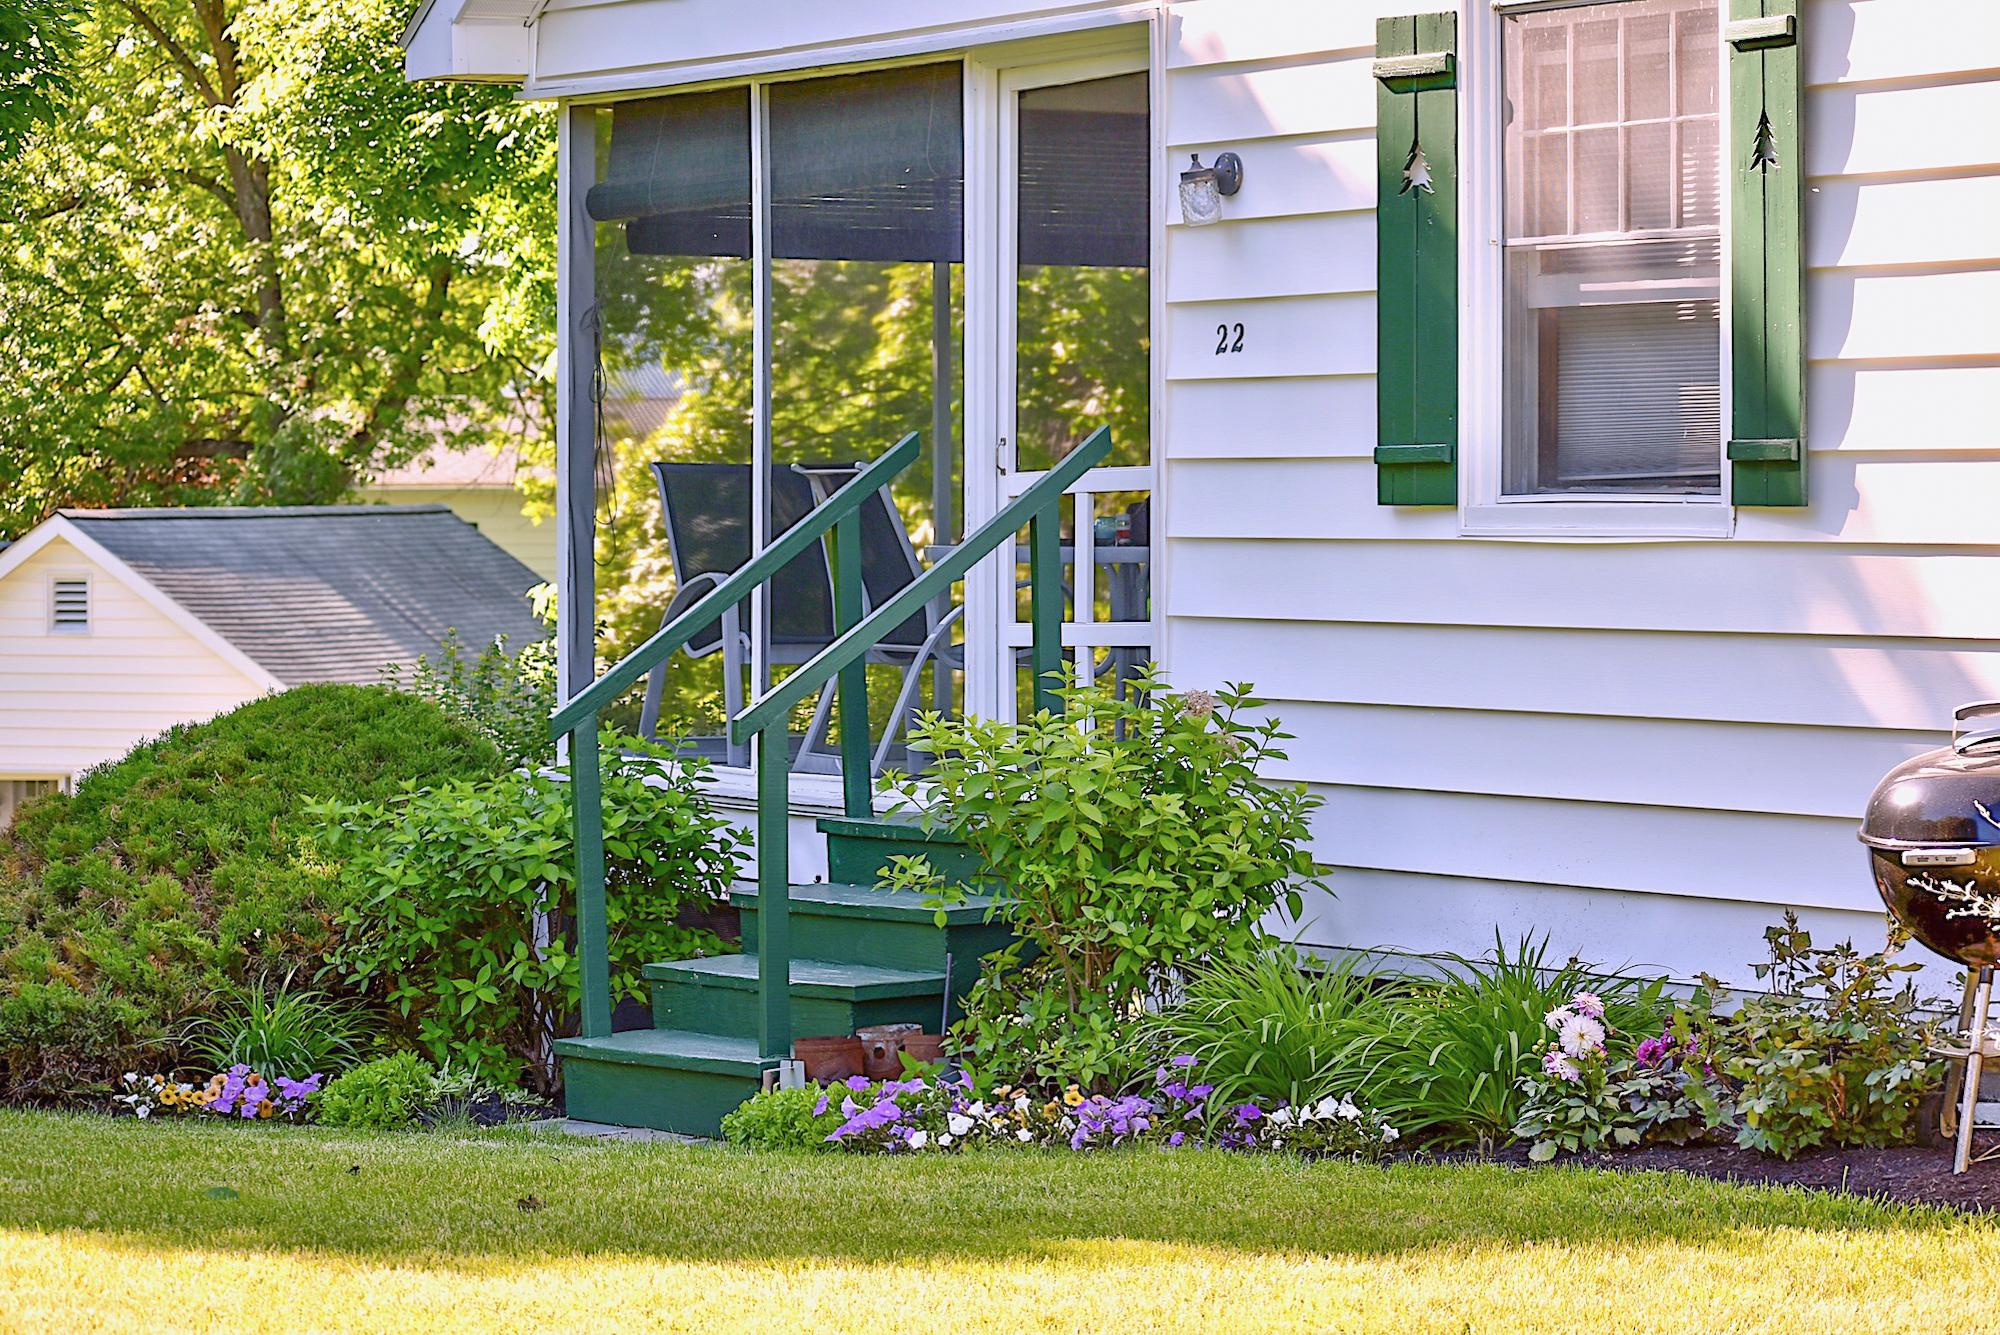 Takundewide Cottage #22 exterior